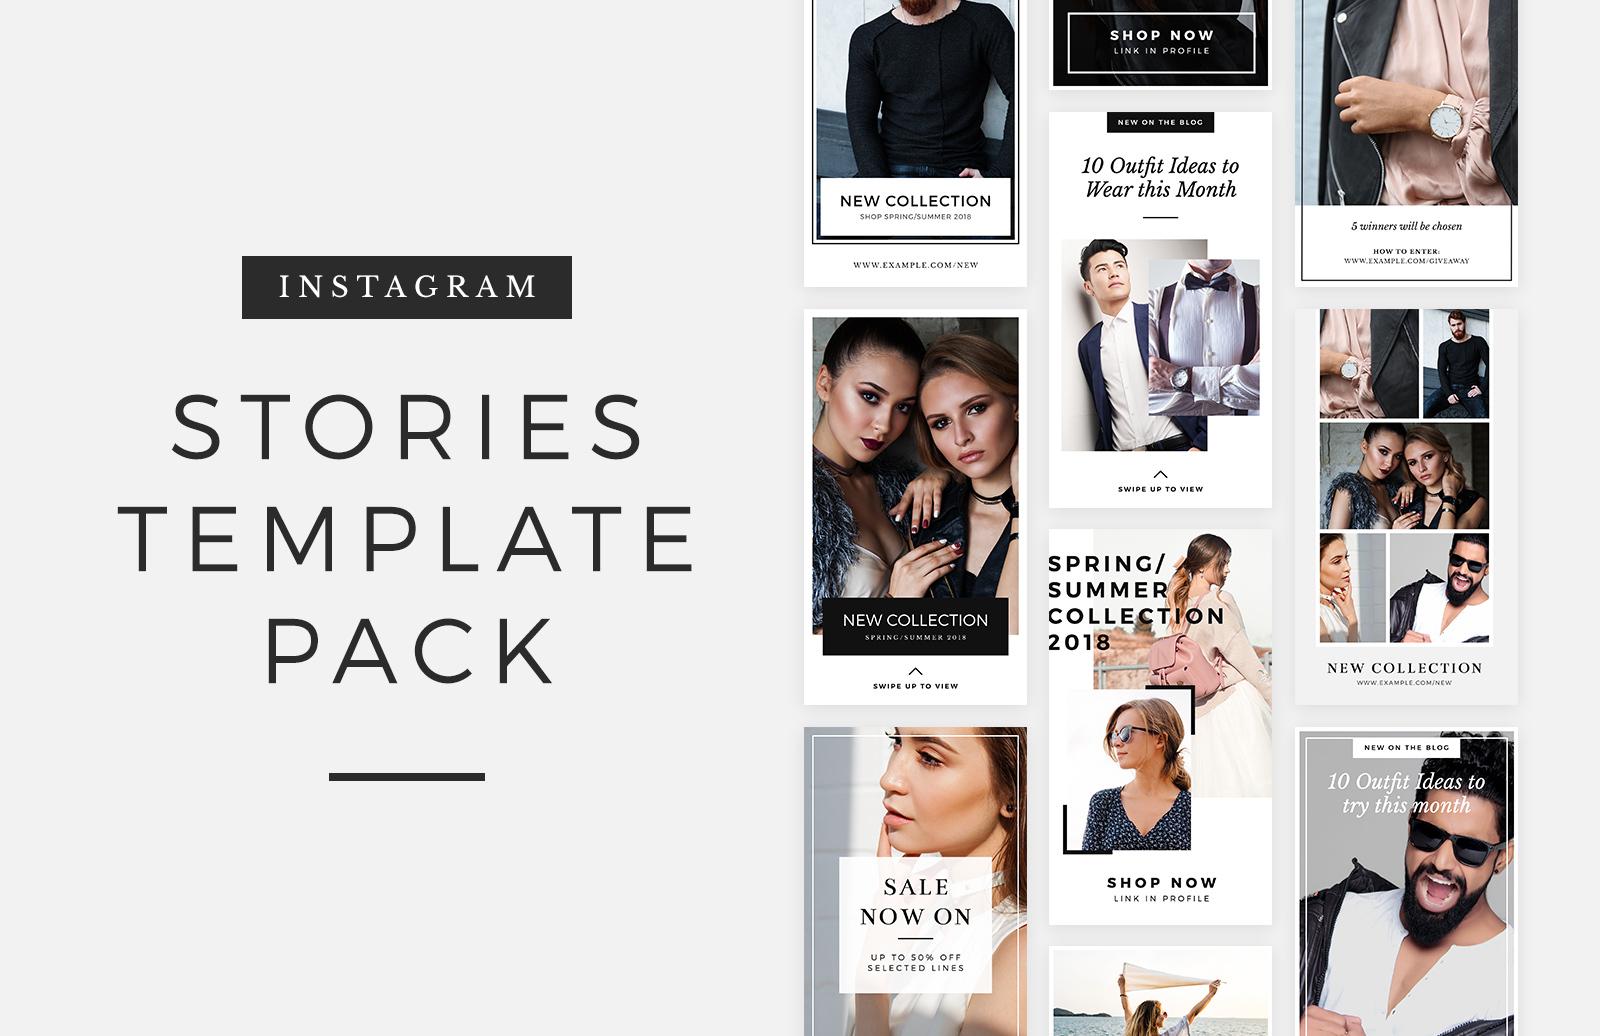 Free Instagram Stories Template Pack